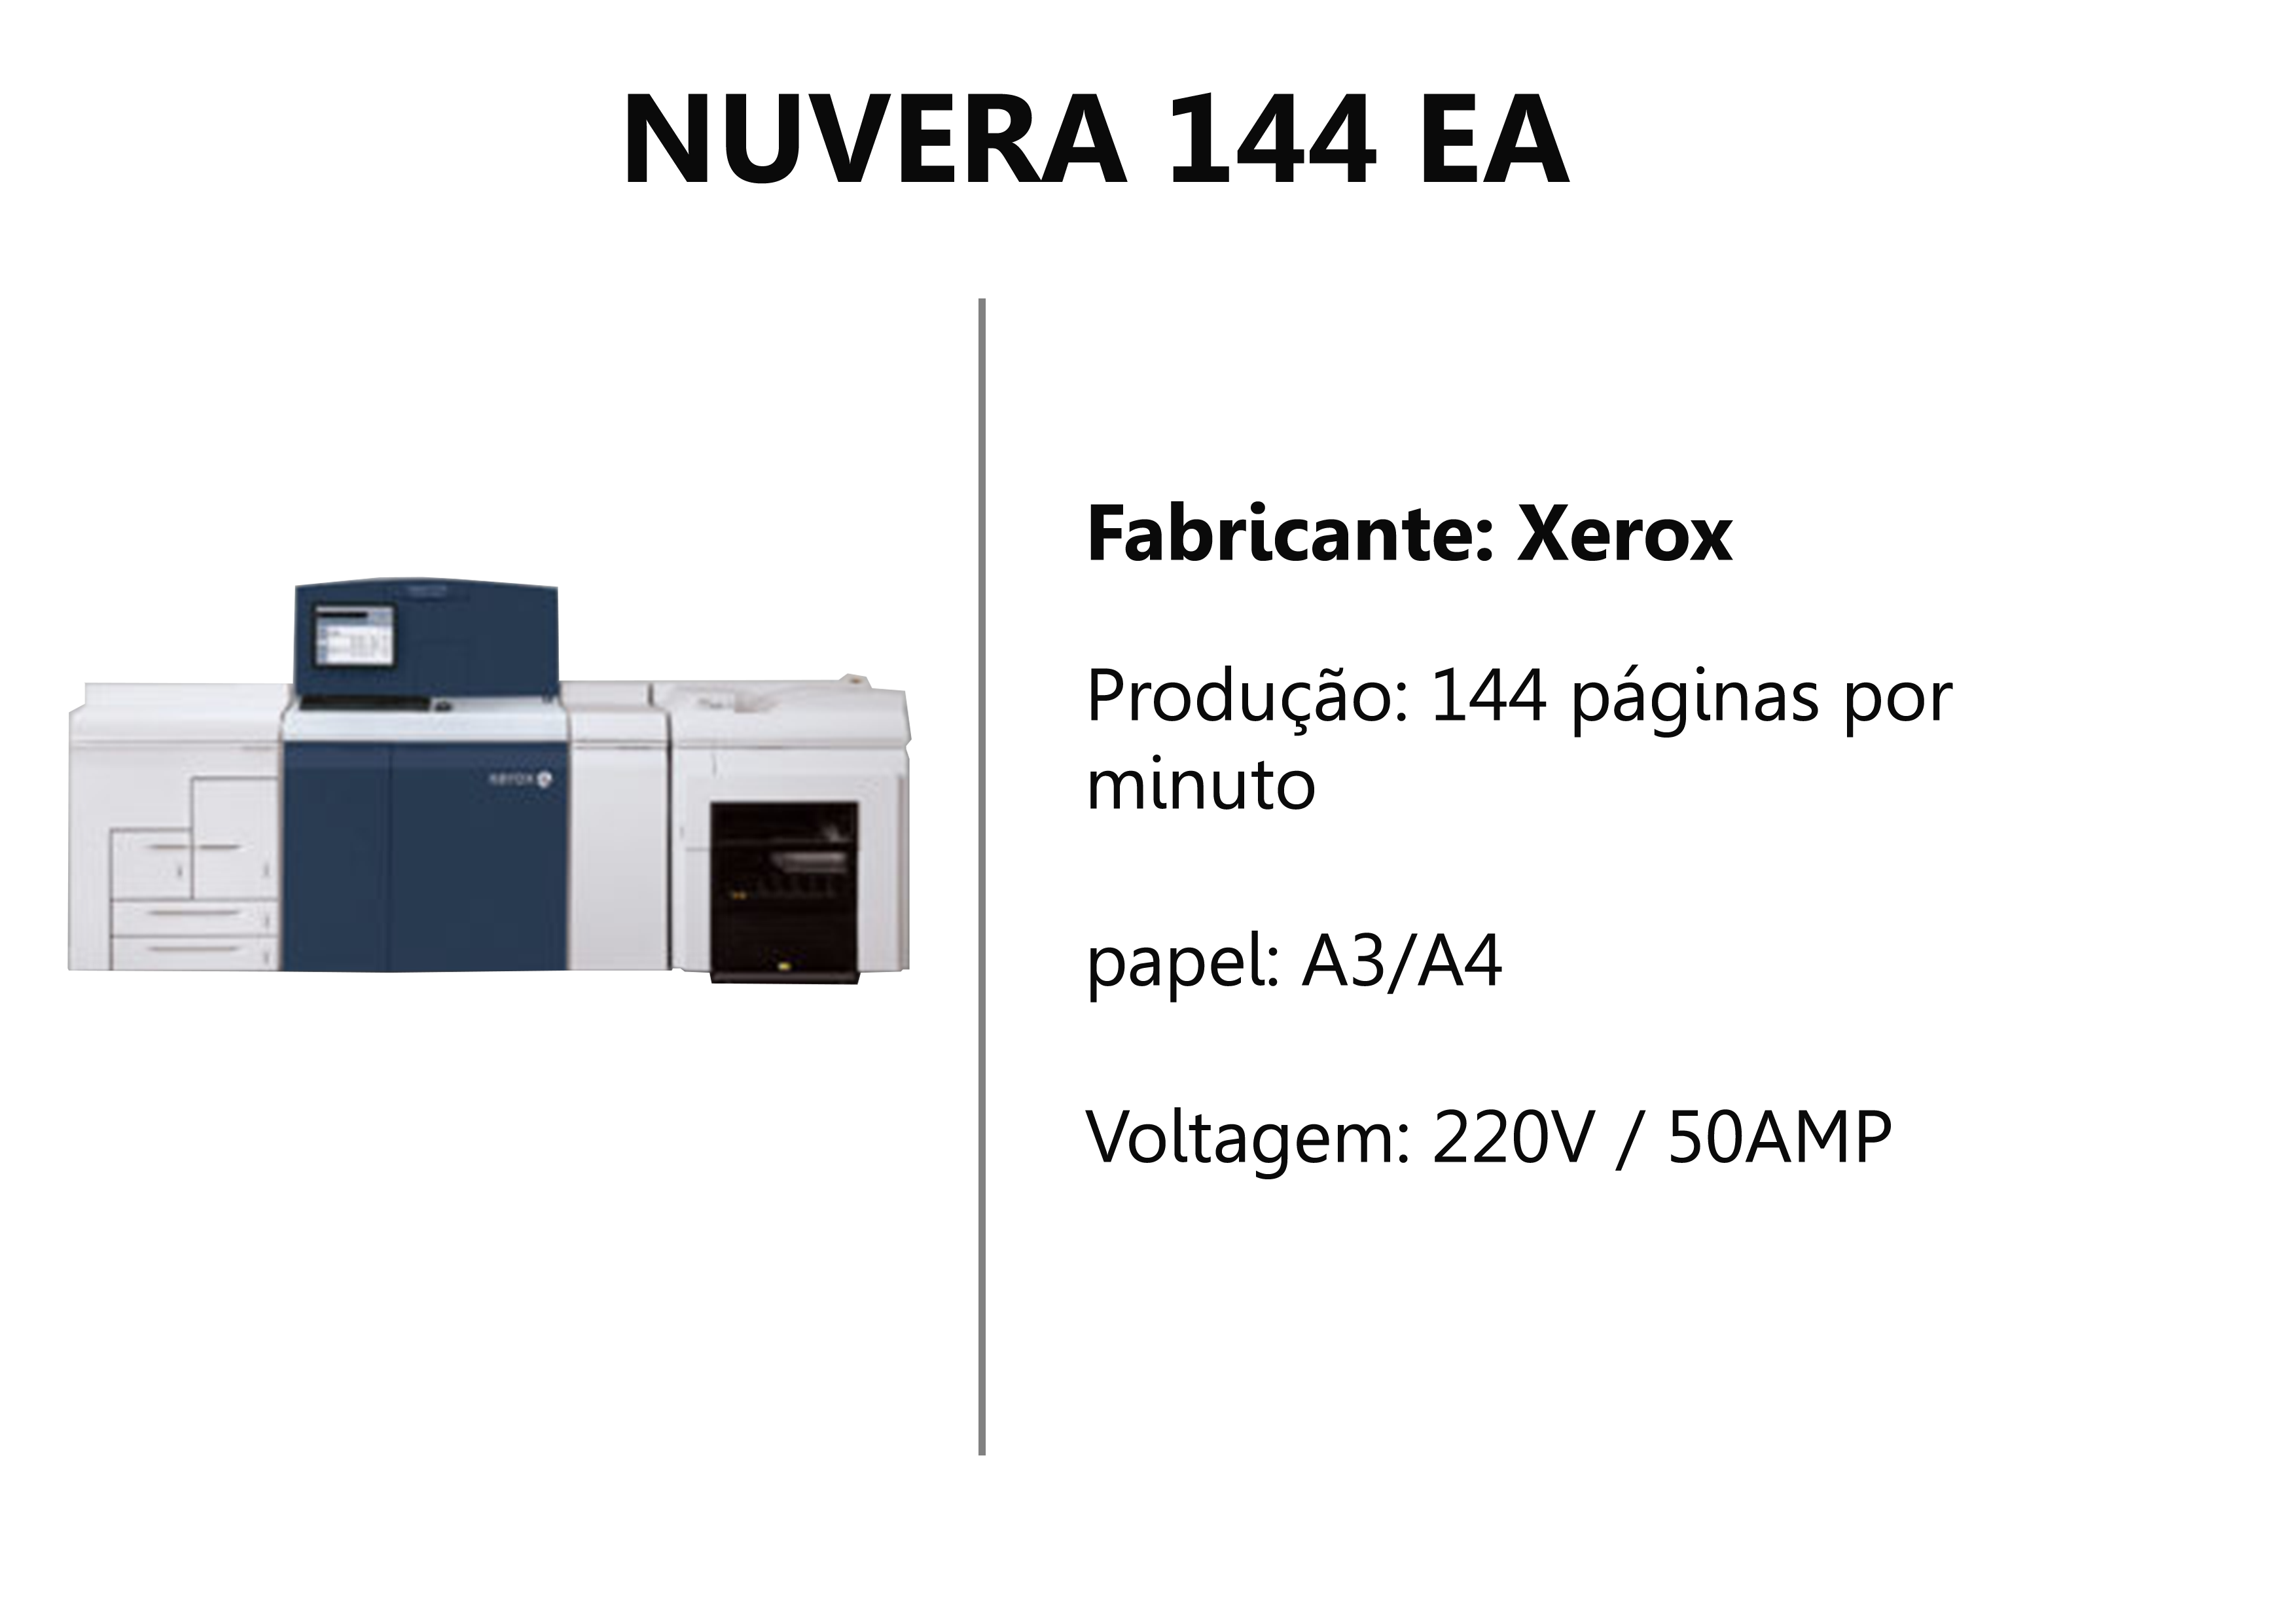 impressora xerox nuvera 144